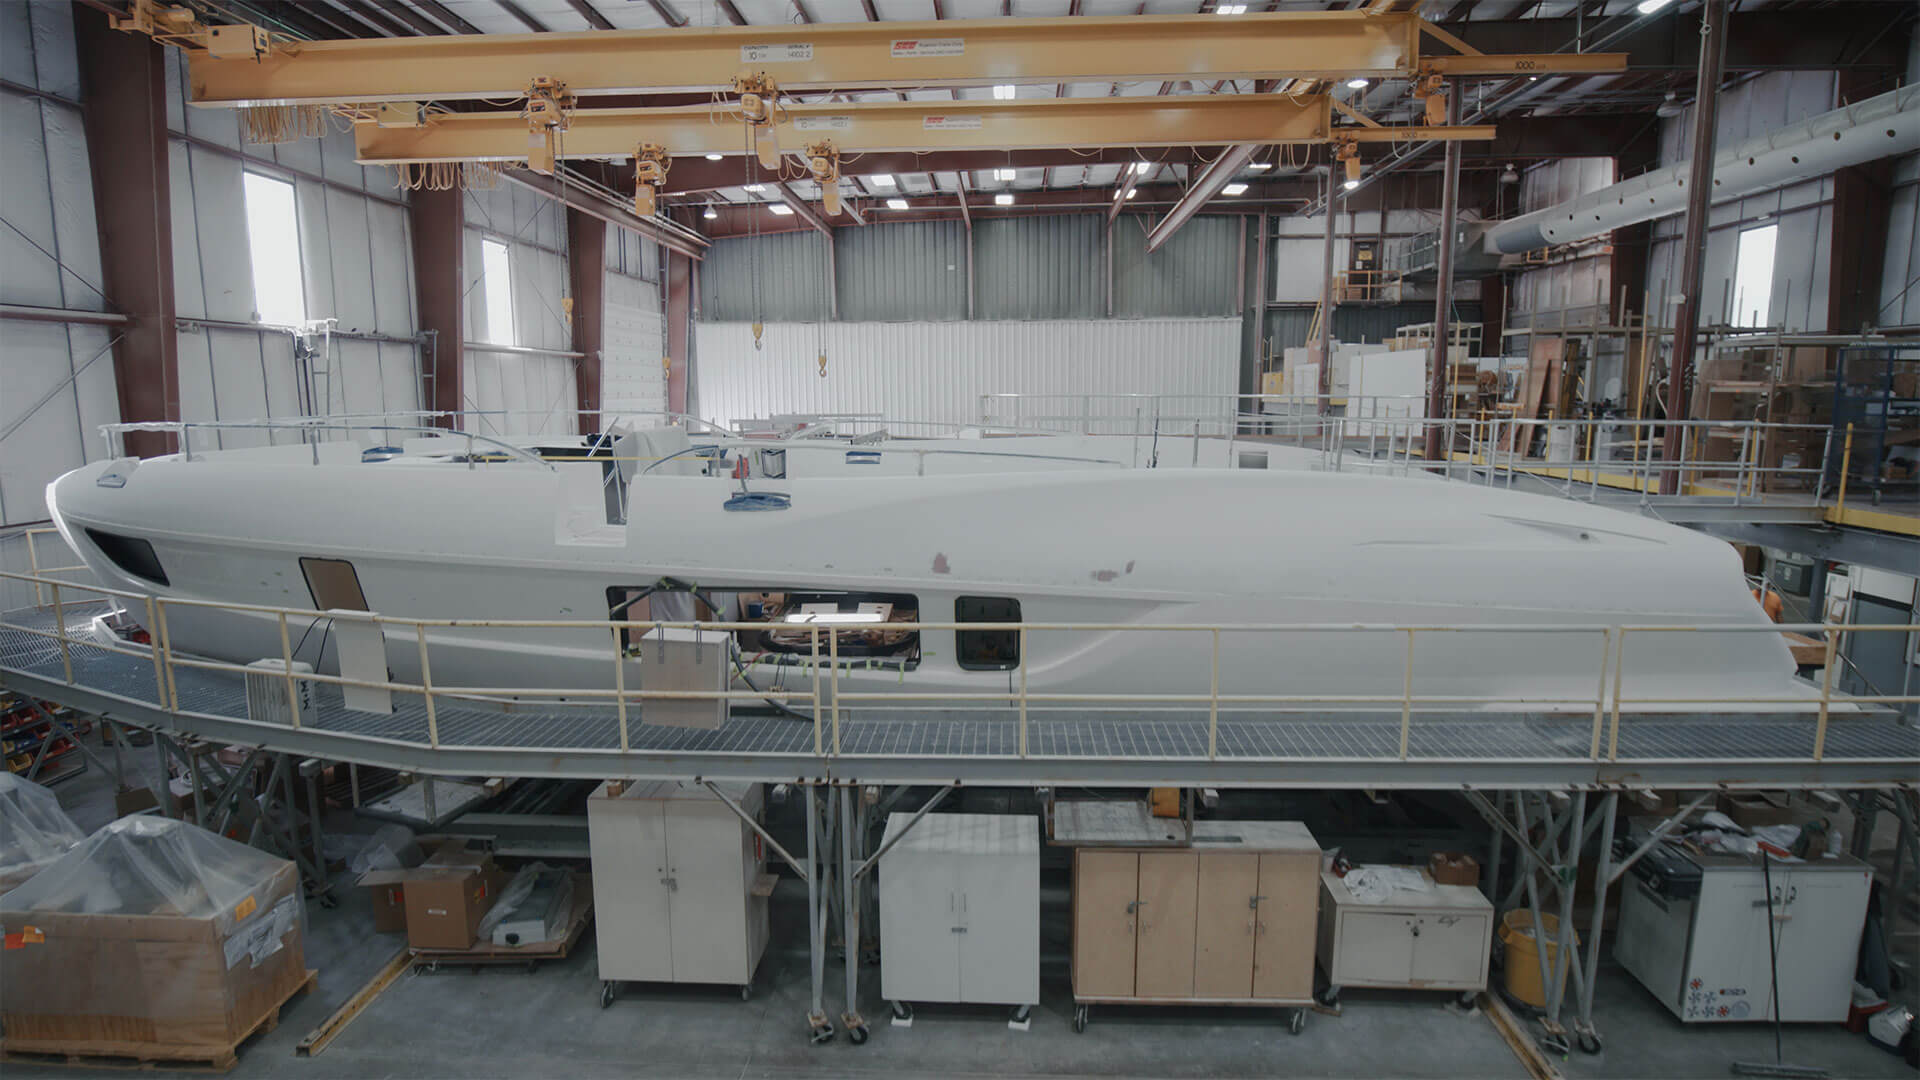 2020 lexus news yacht ly 650 gallery 04